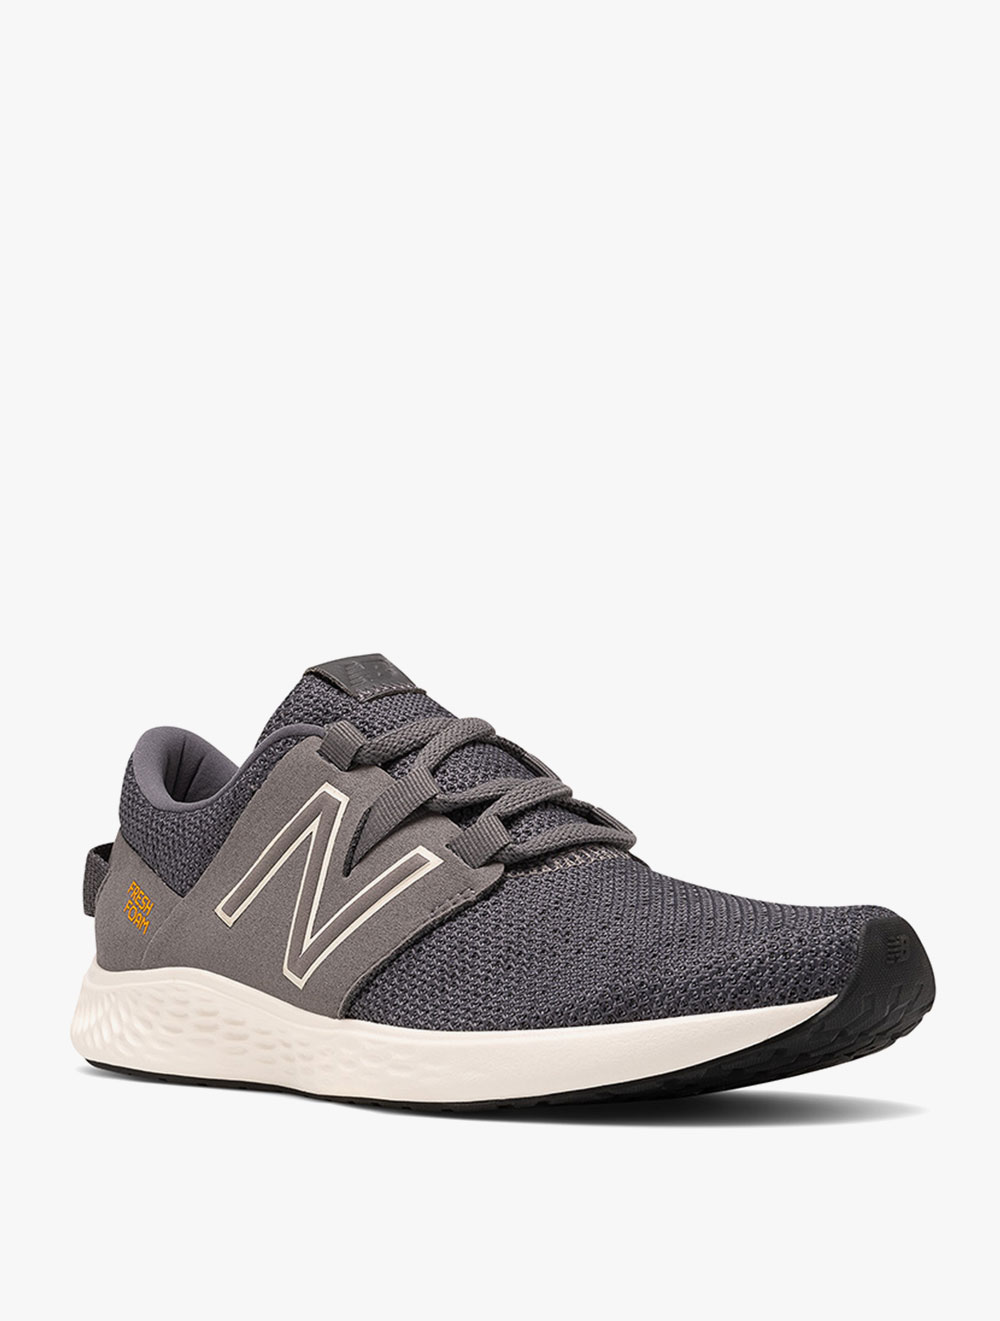 Shop New Balance 247 Lifestyle Shoes Online on ZALORA